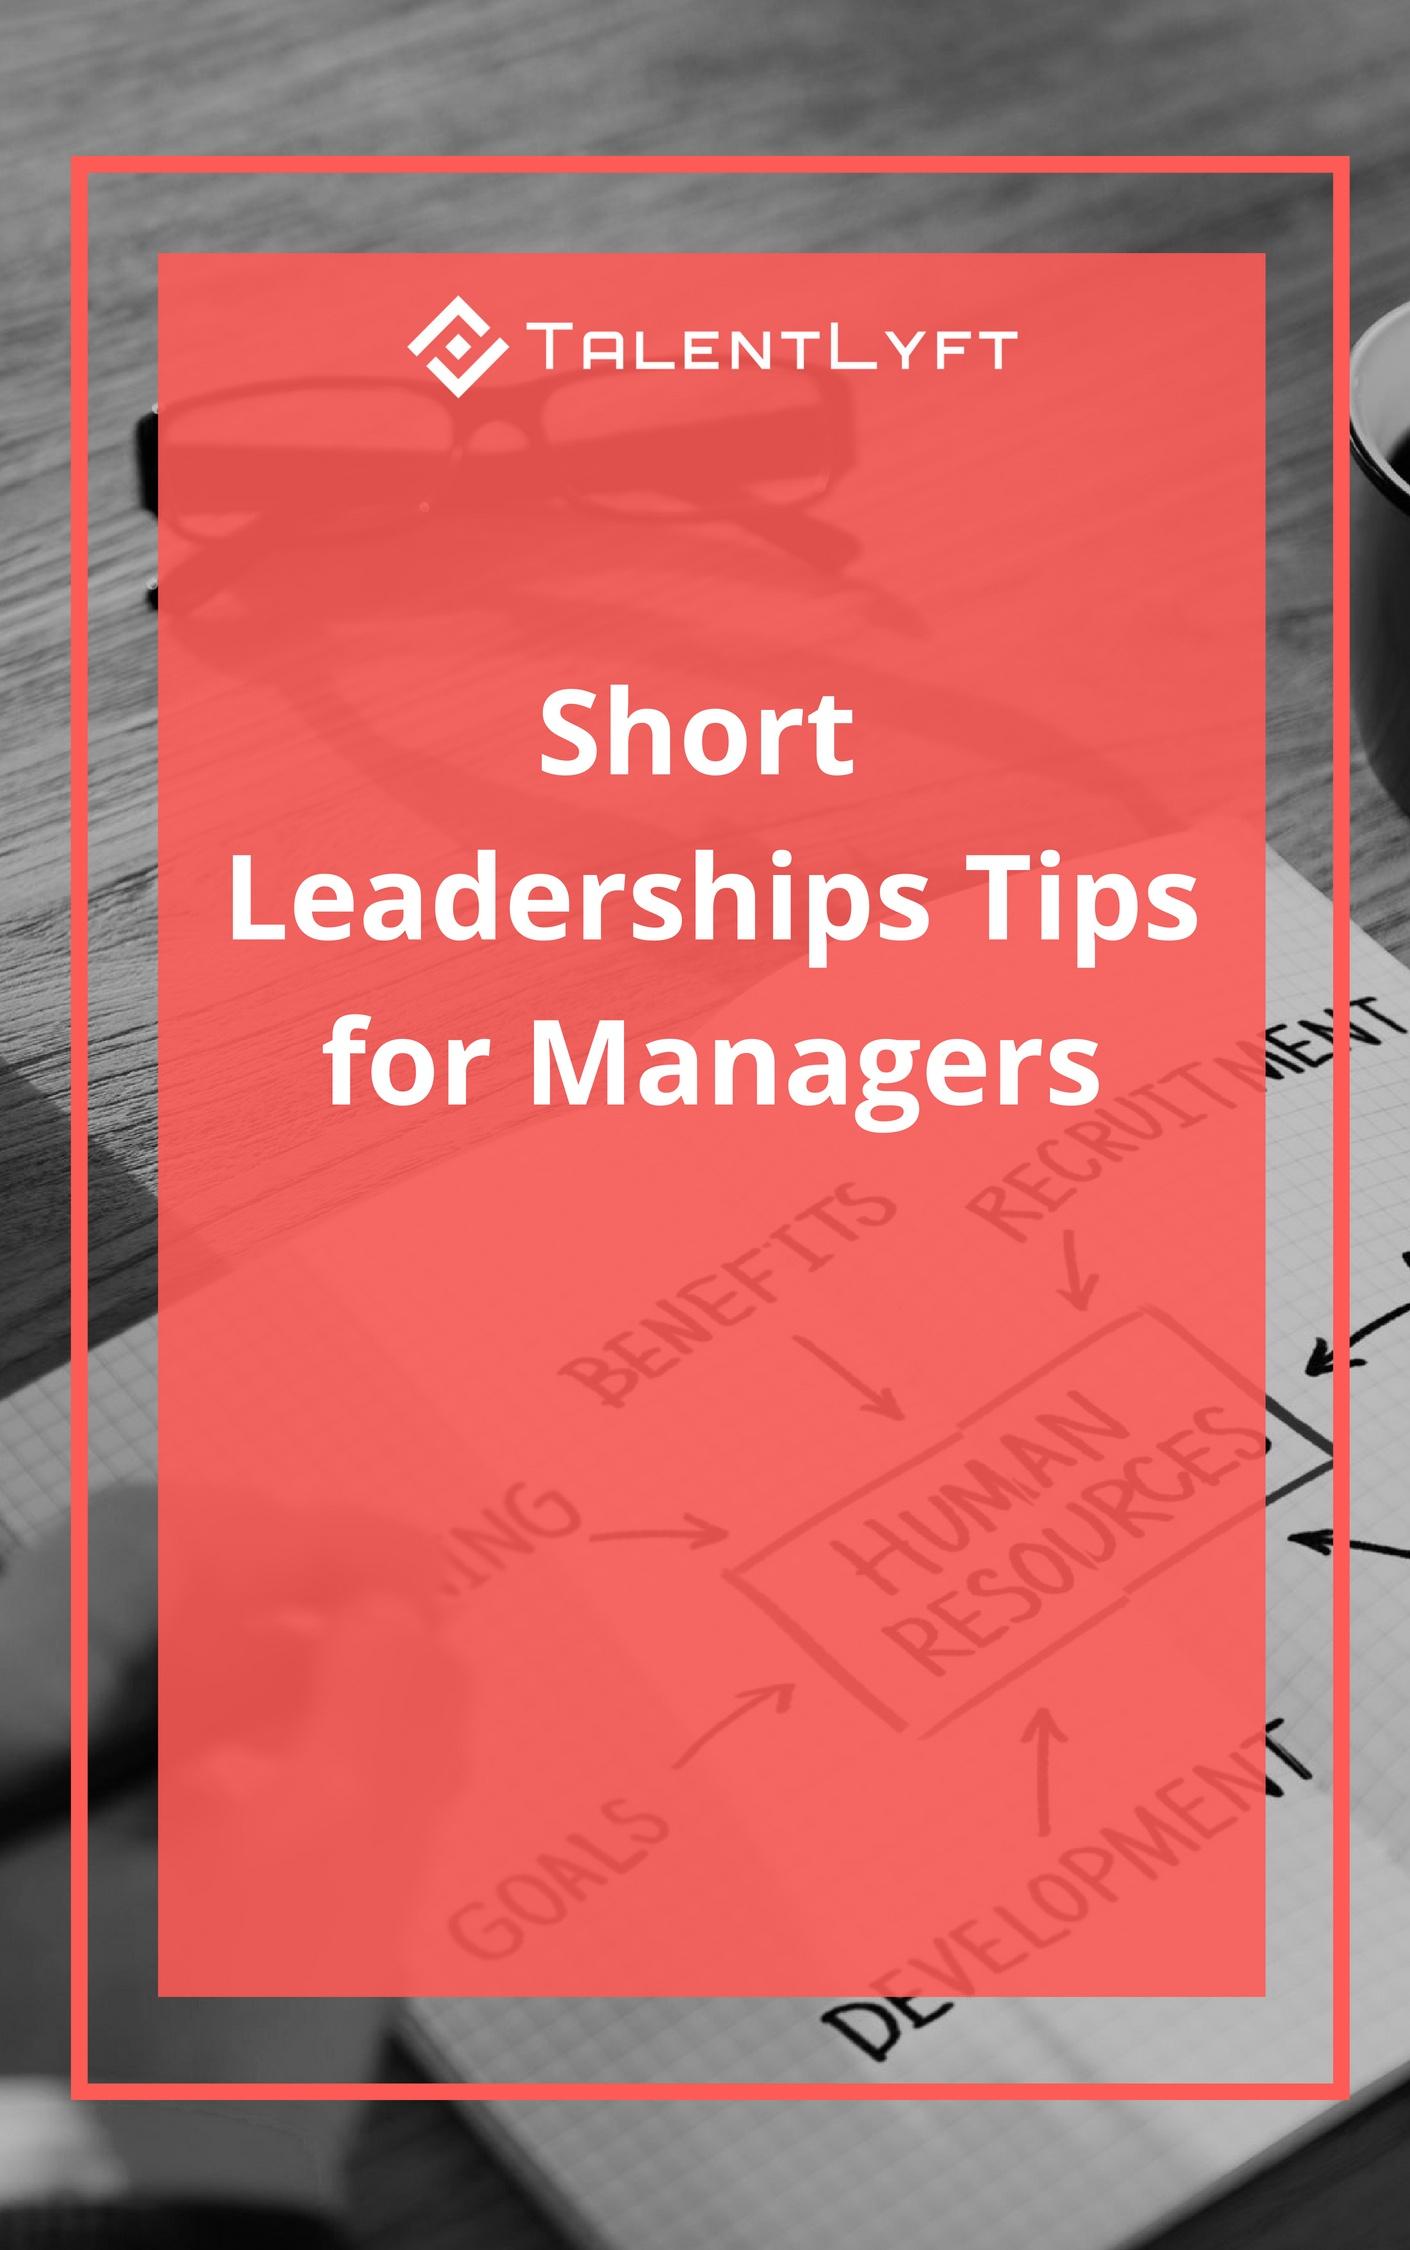 Short Leaderships Tips for Managers.jpg